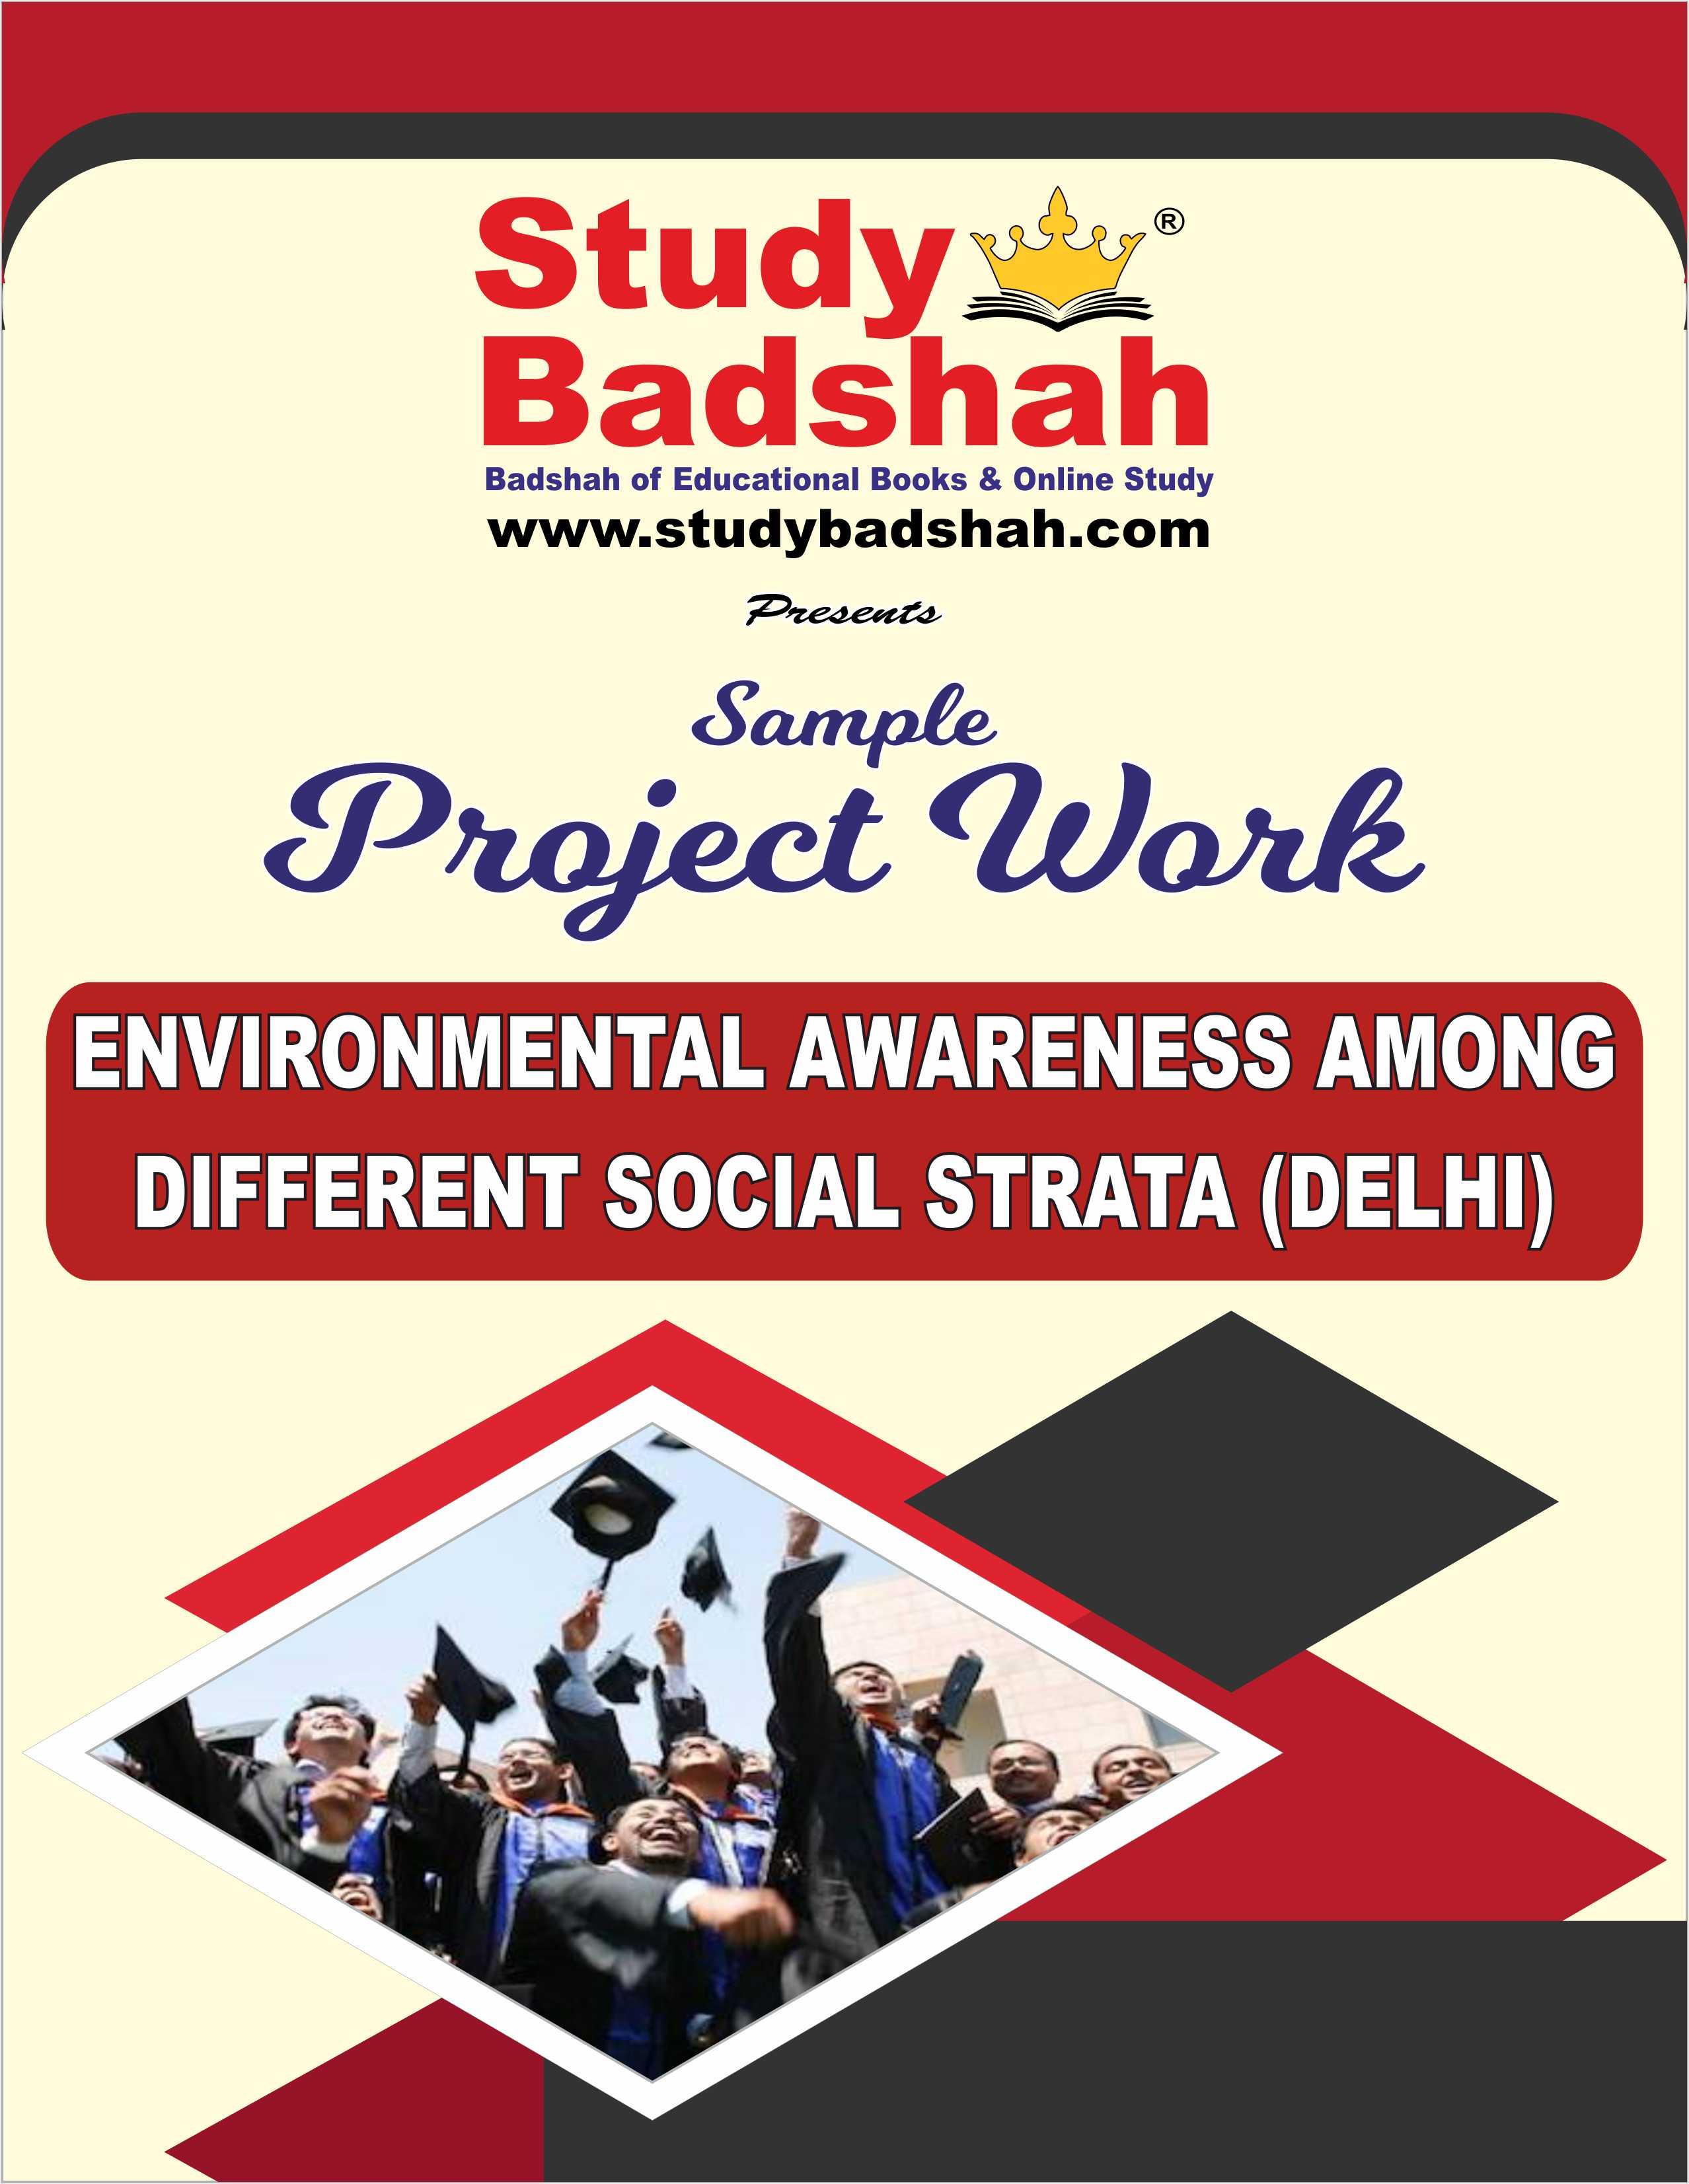 ENVIRONMENTAL AWARENESS AMONG DIFFERENT SOCIAL STRATA (DELHI)